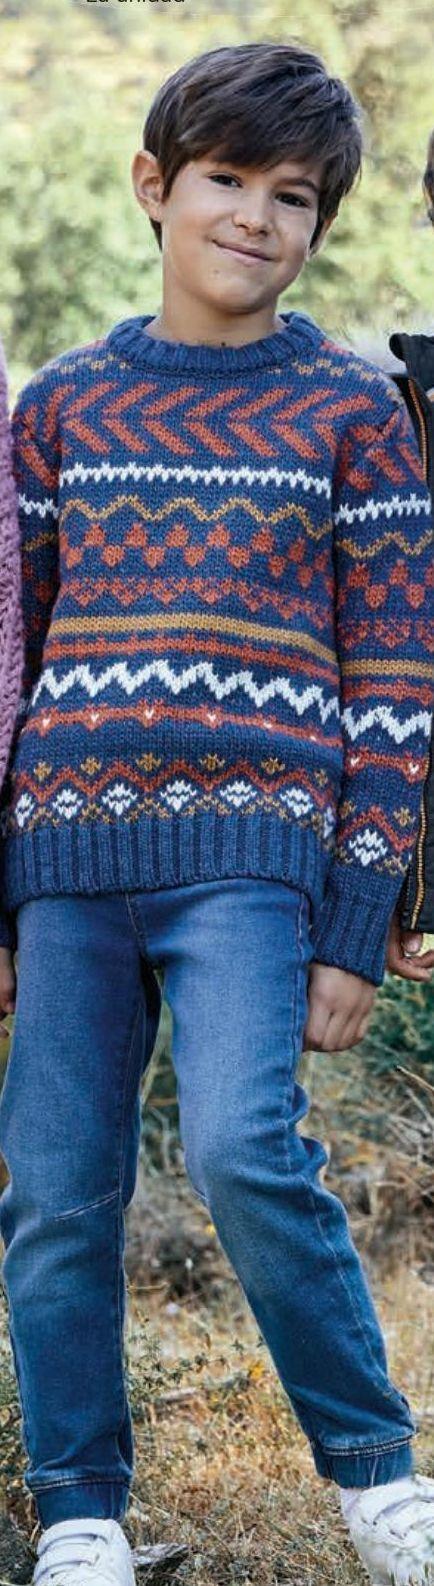 Oferta de Jersey grecas, sudadera contraste, pantalón denim por 15€